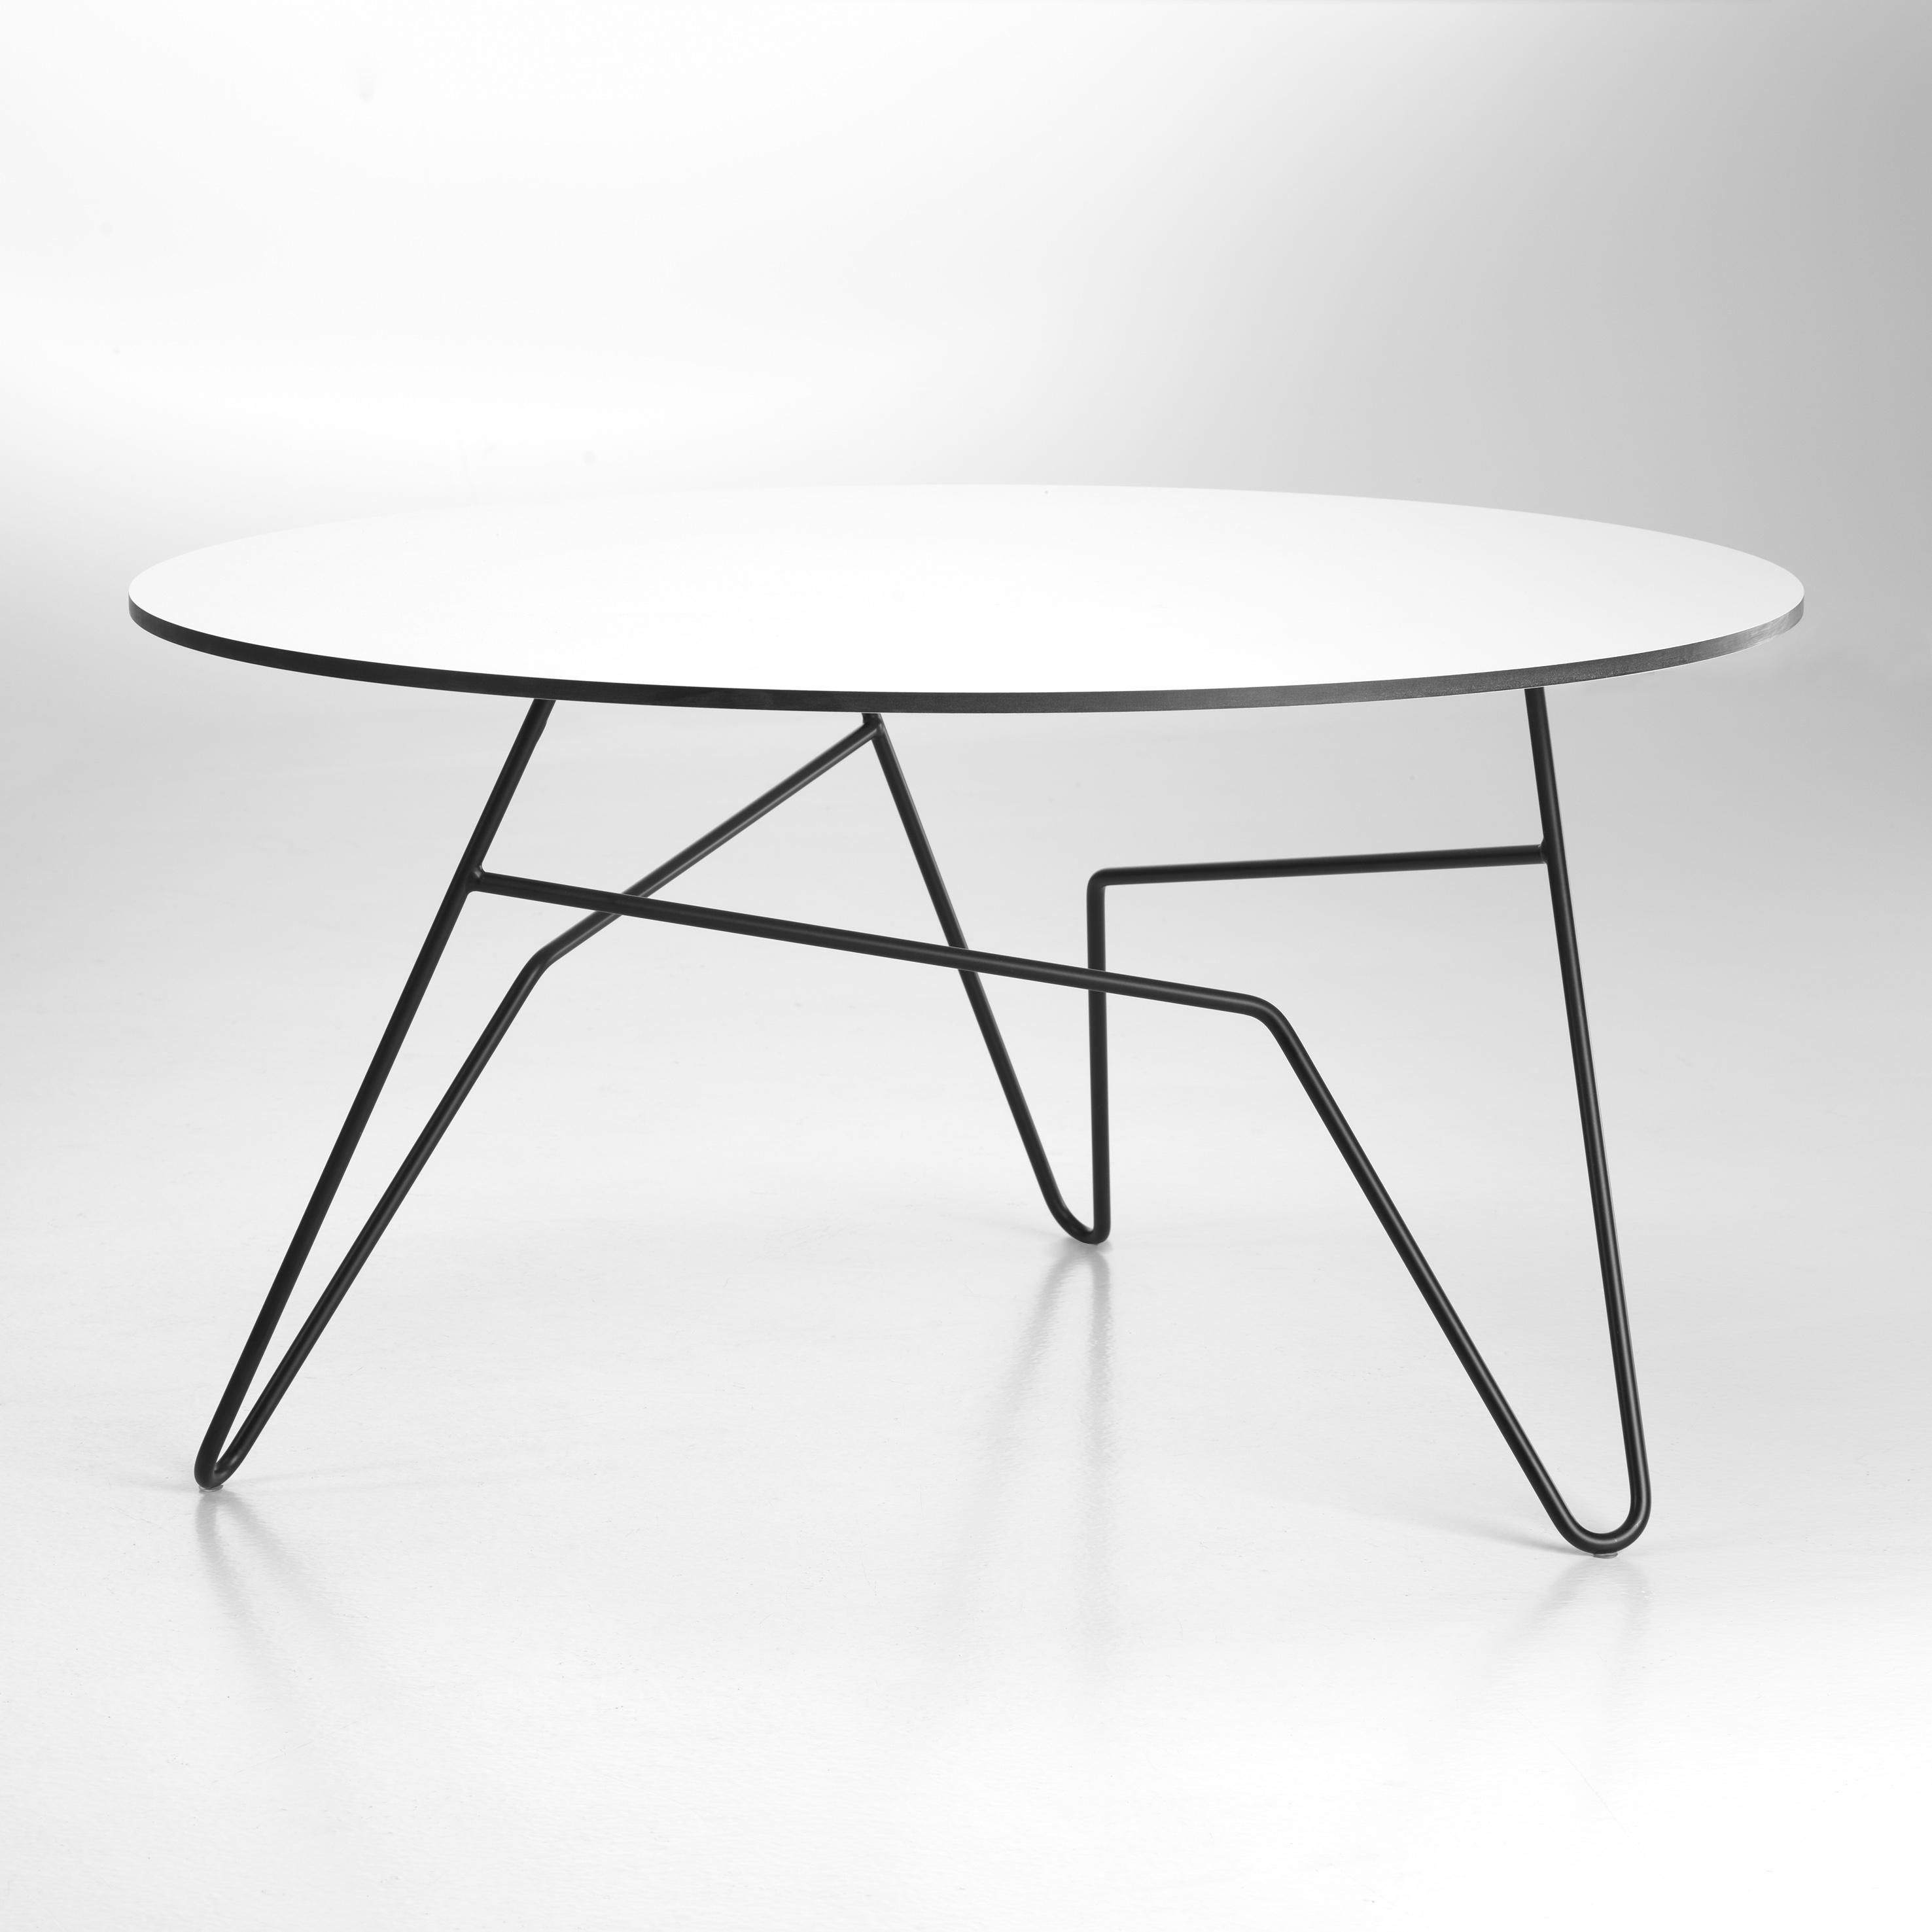 Image of Twist Table Ø85 Hvid - Sort Stel